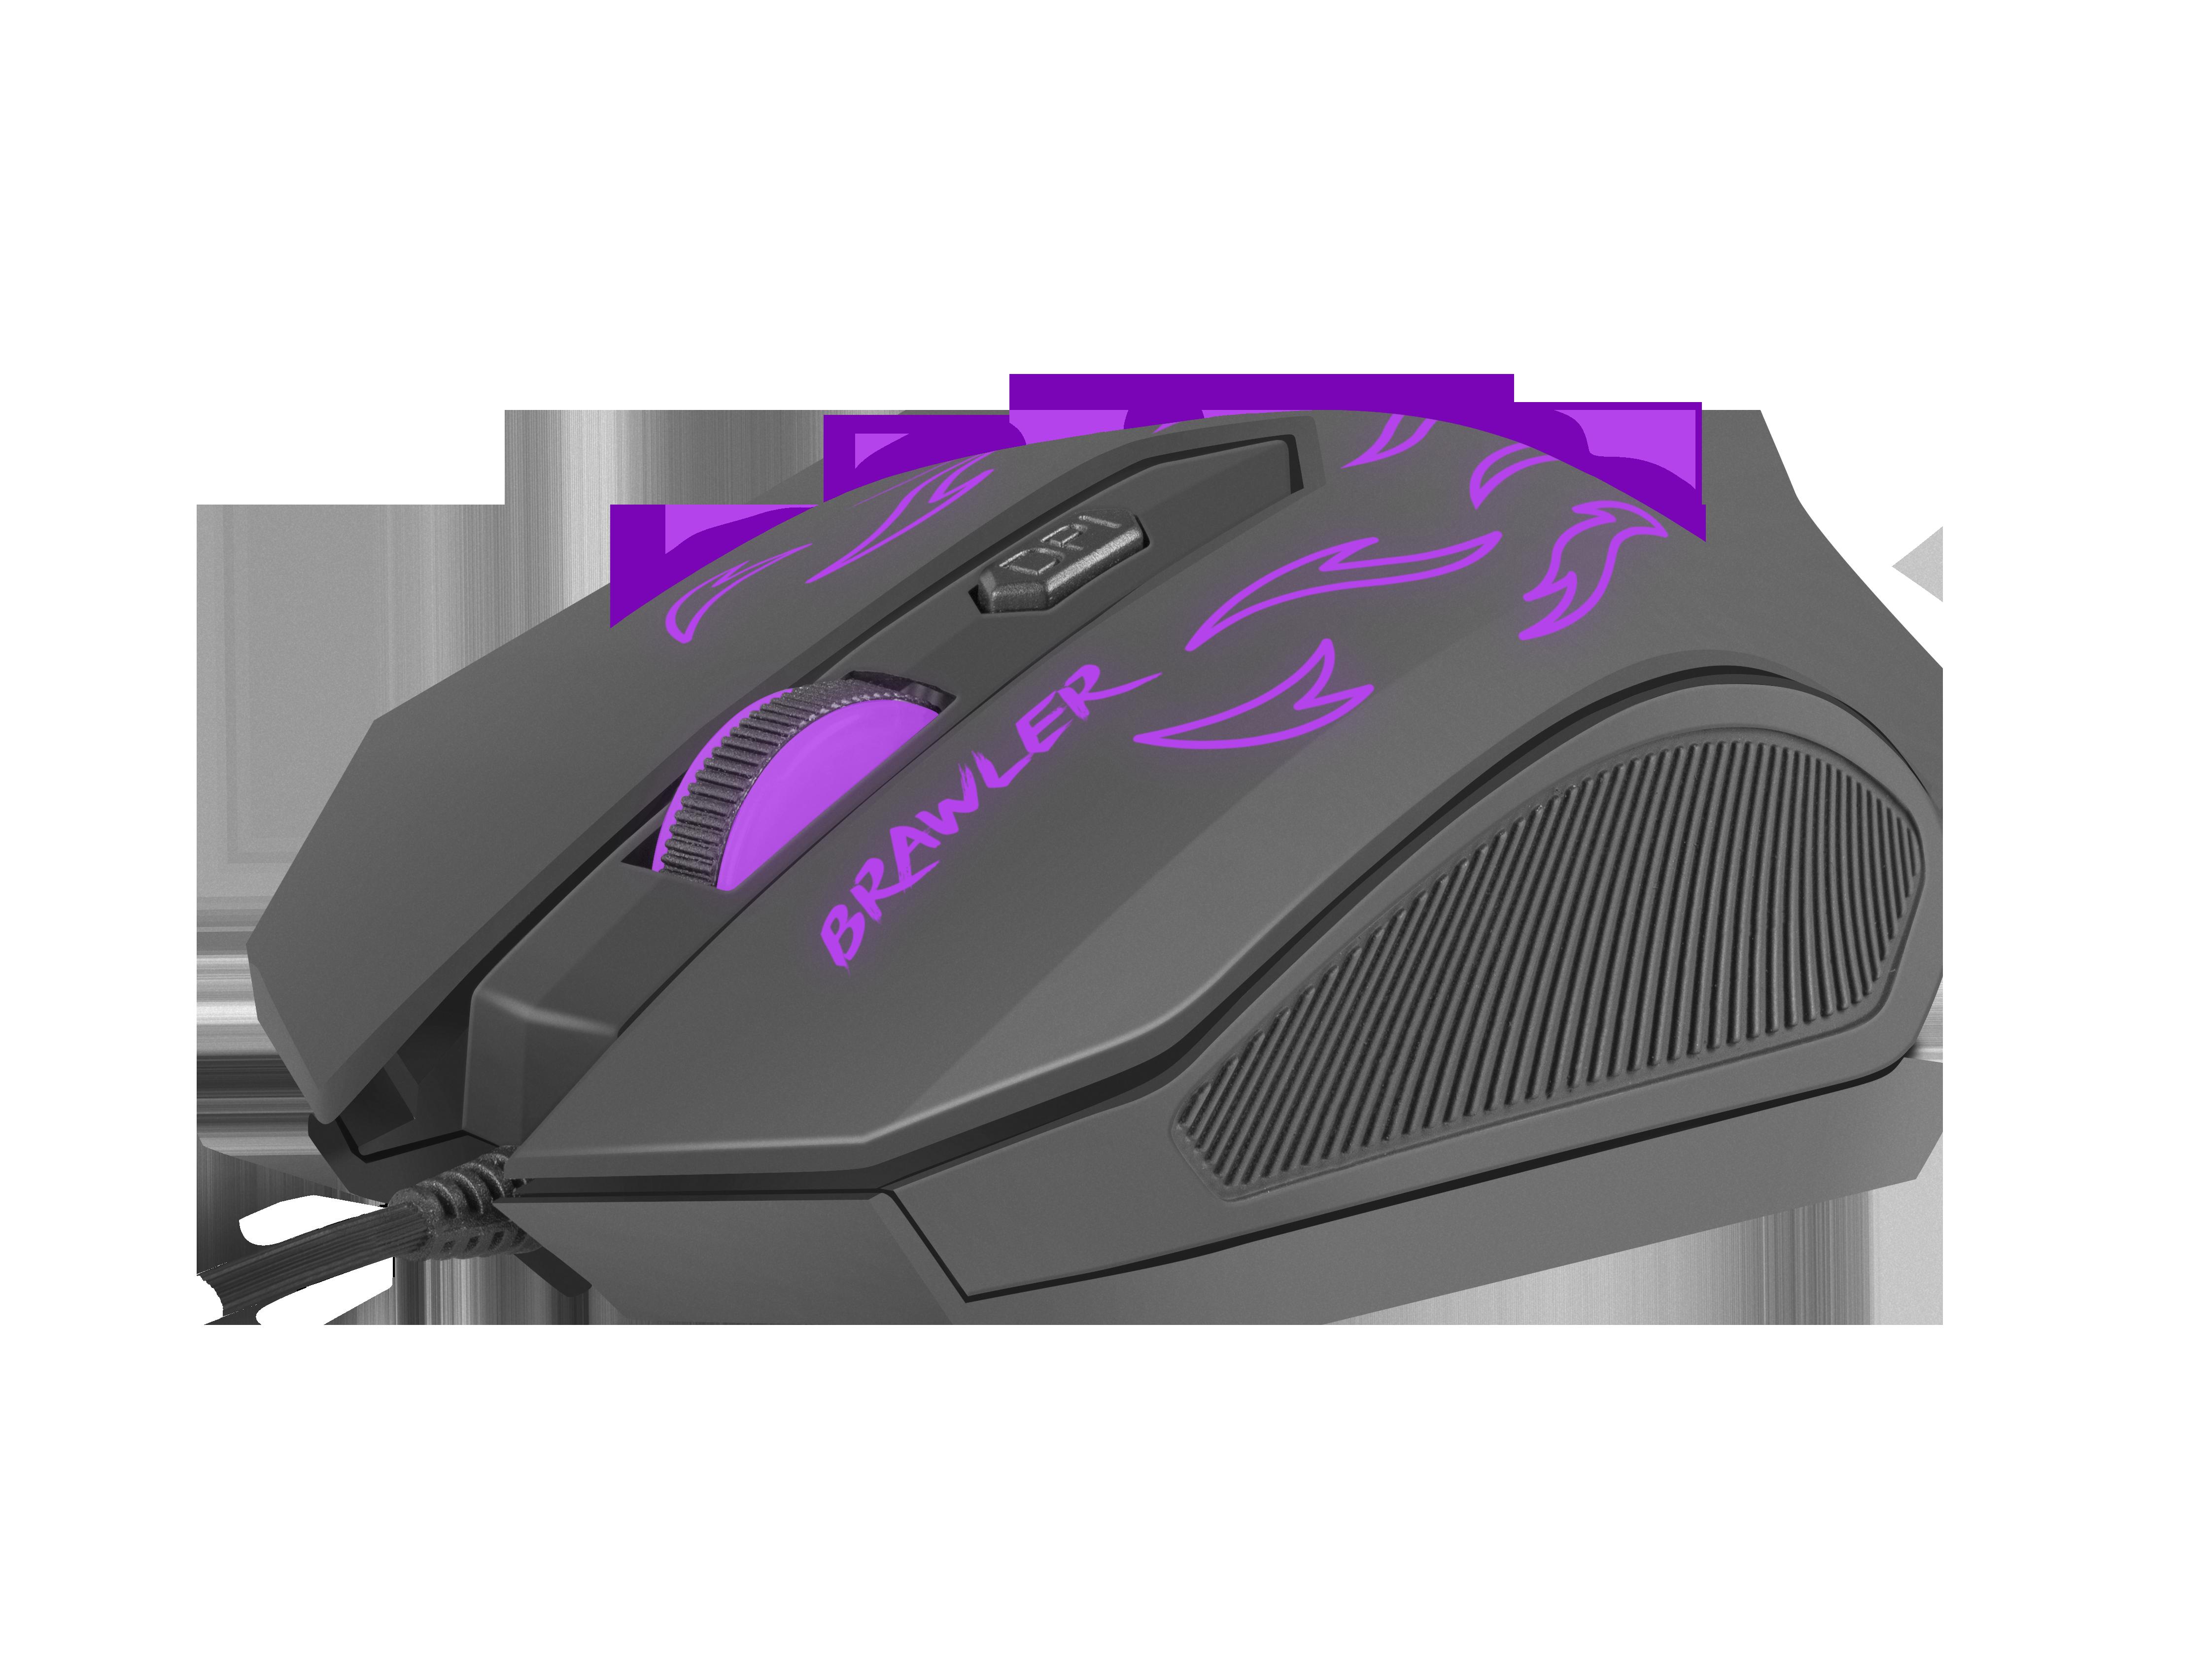 Brawler-3-violet